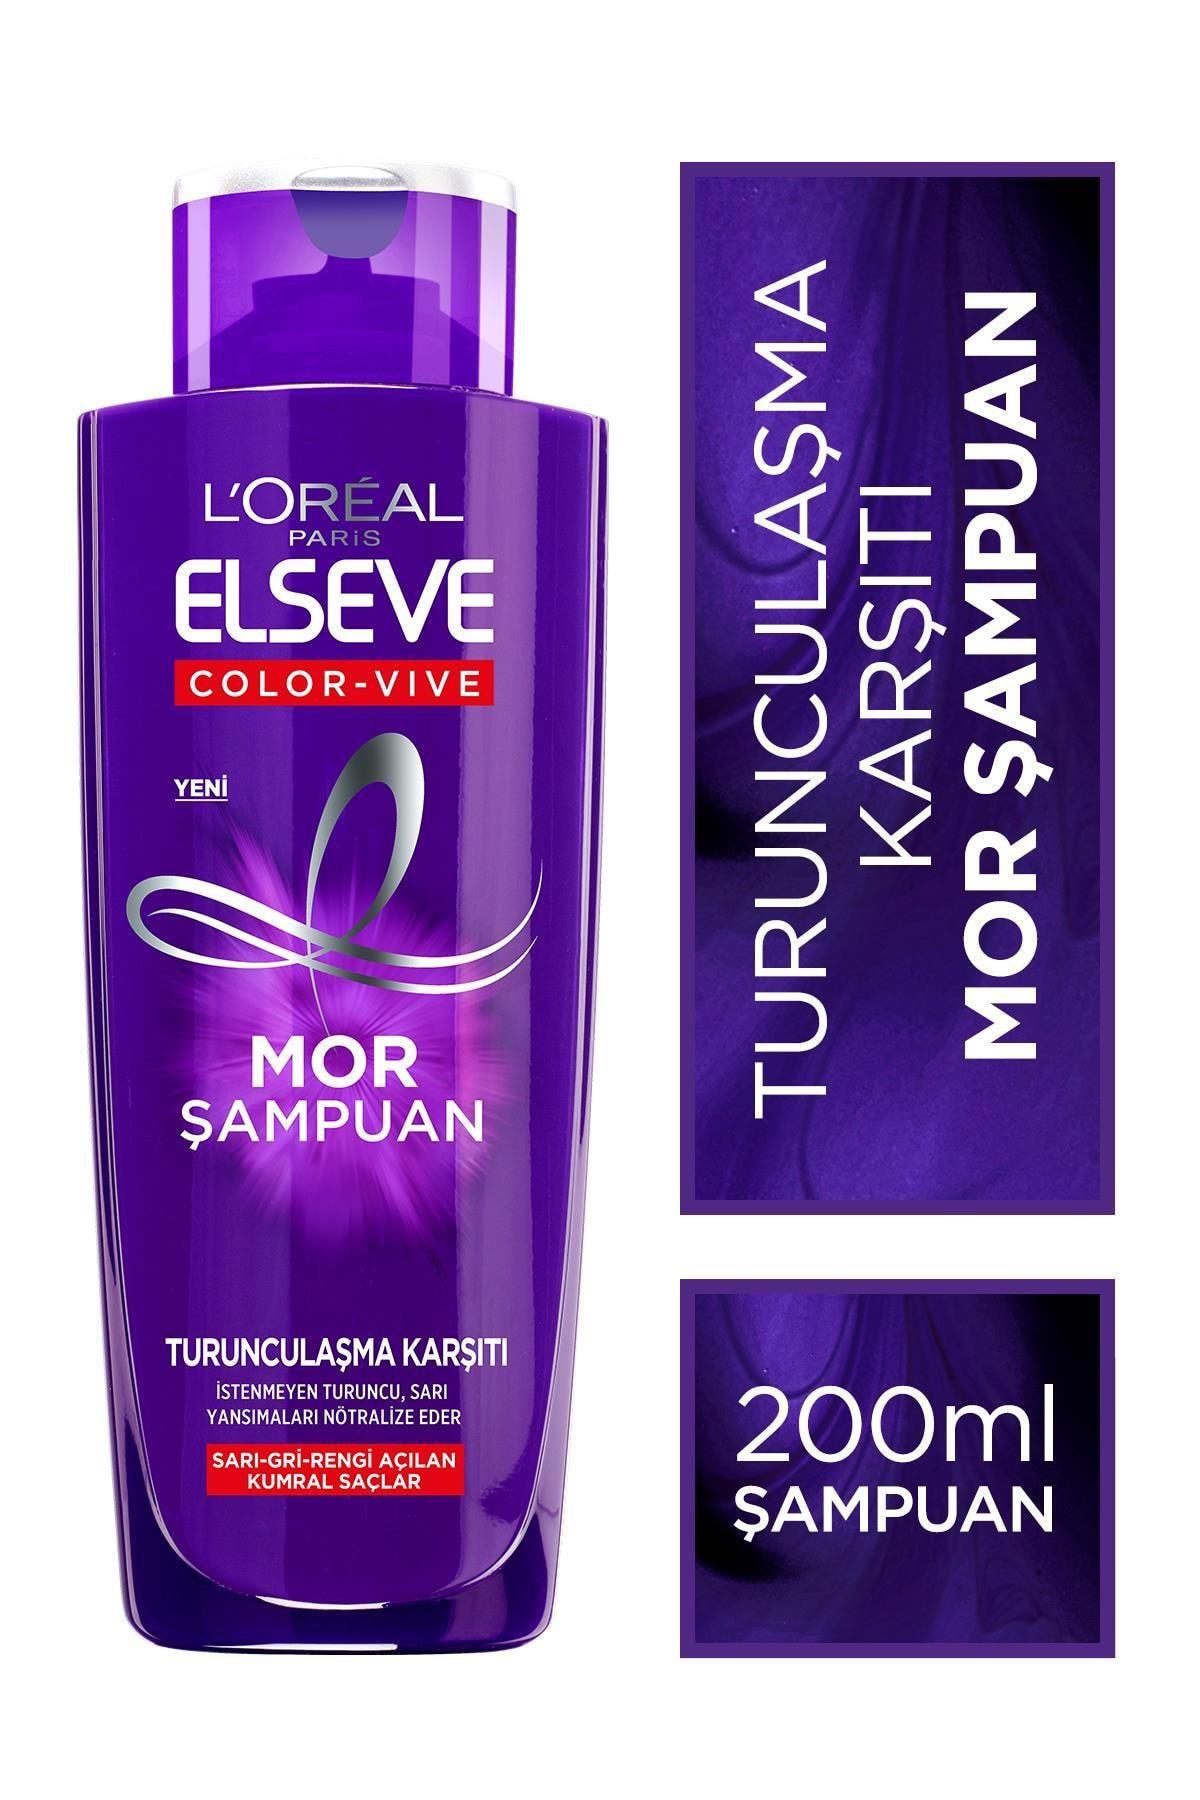 Elseve L'oréal Paris Elseve Turunculaşma Karşıtı Mor Şampuan 200ml 0